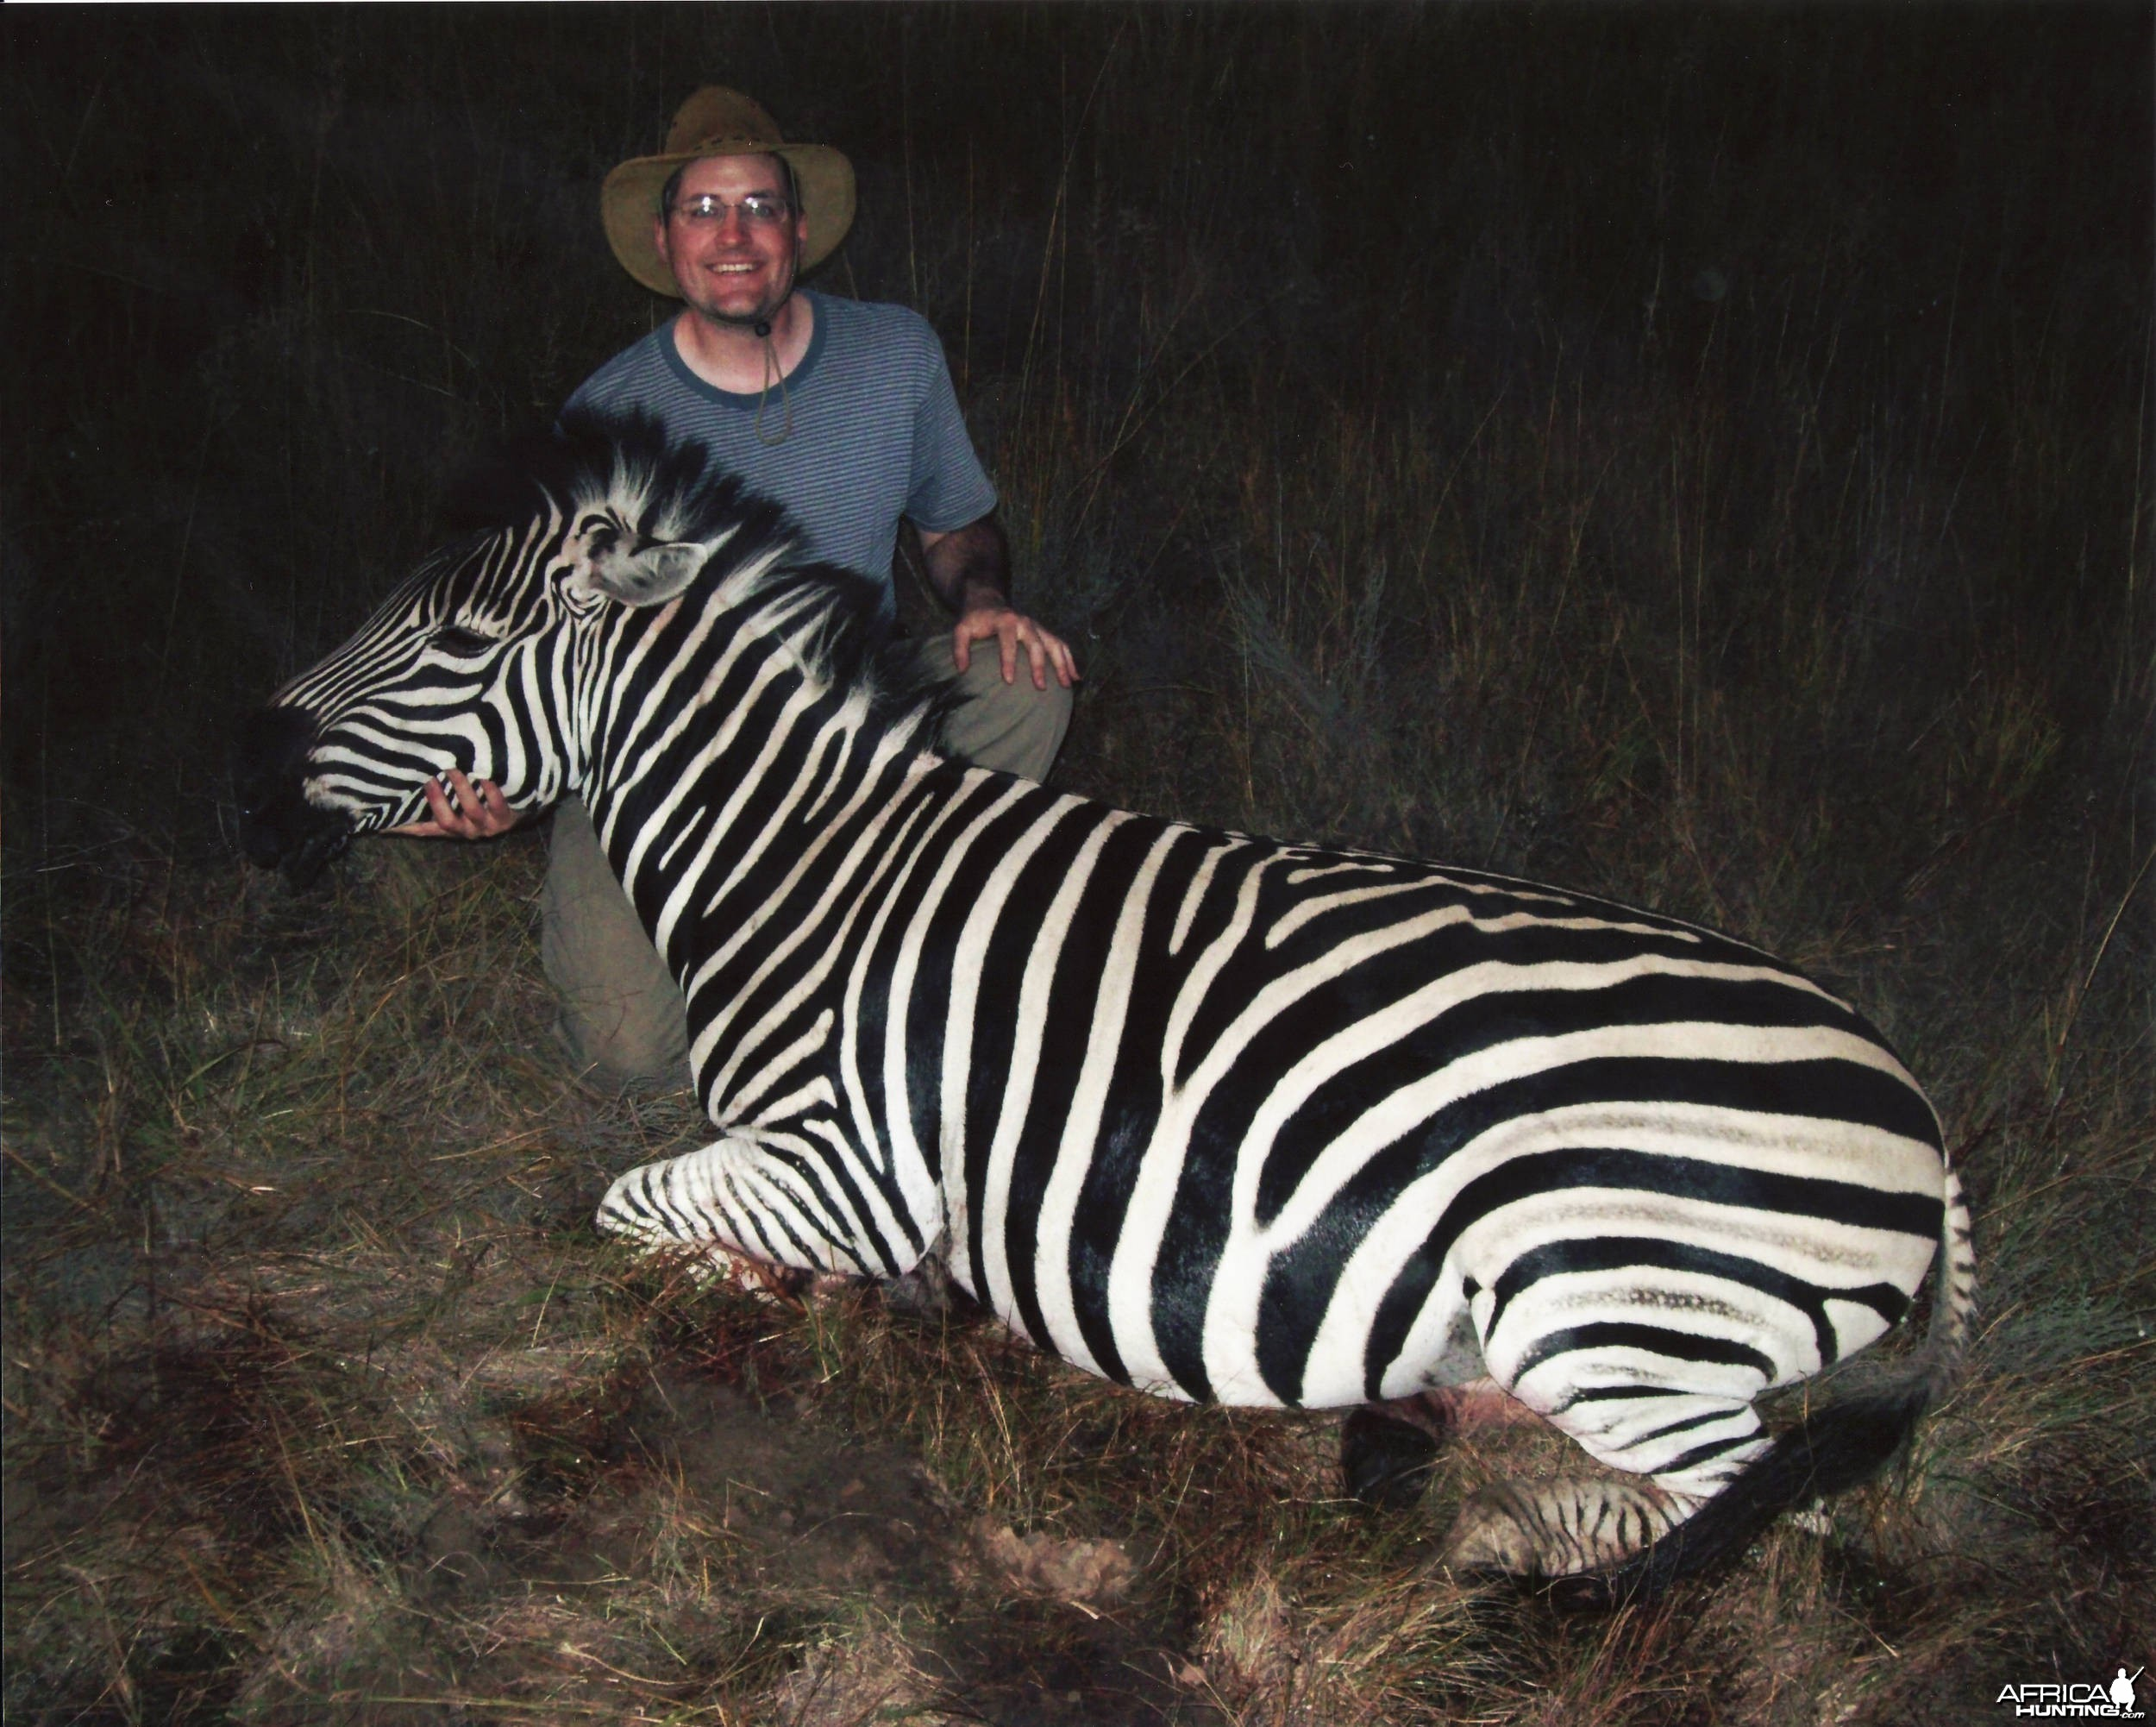 Burchell Zebra - Mhimbi Safari